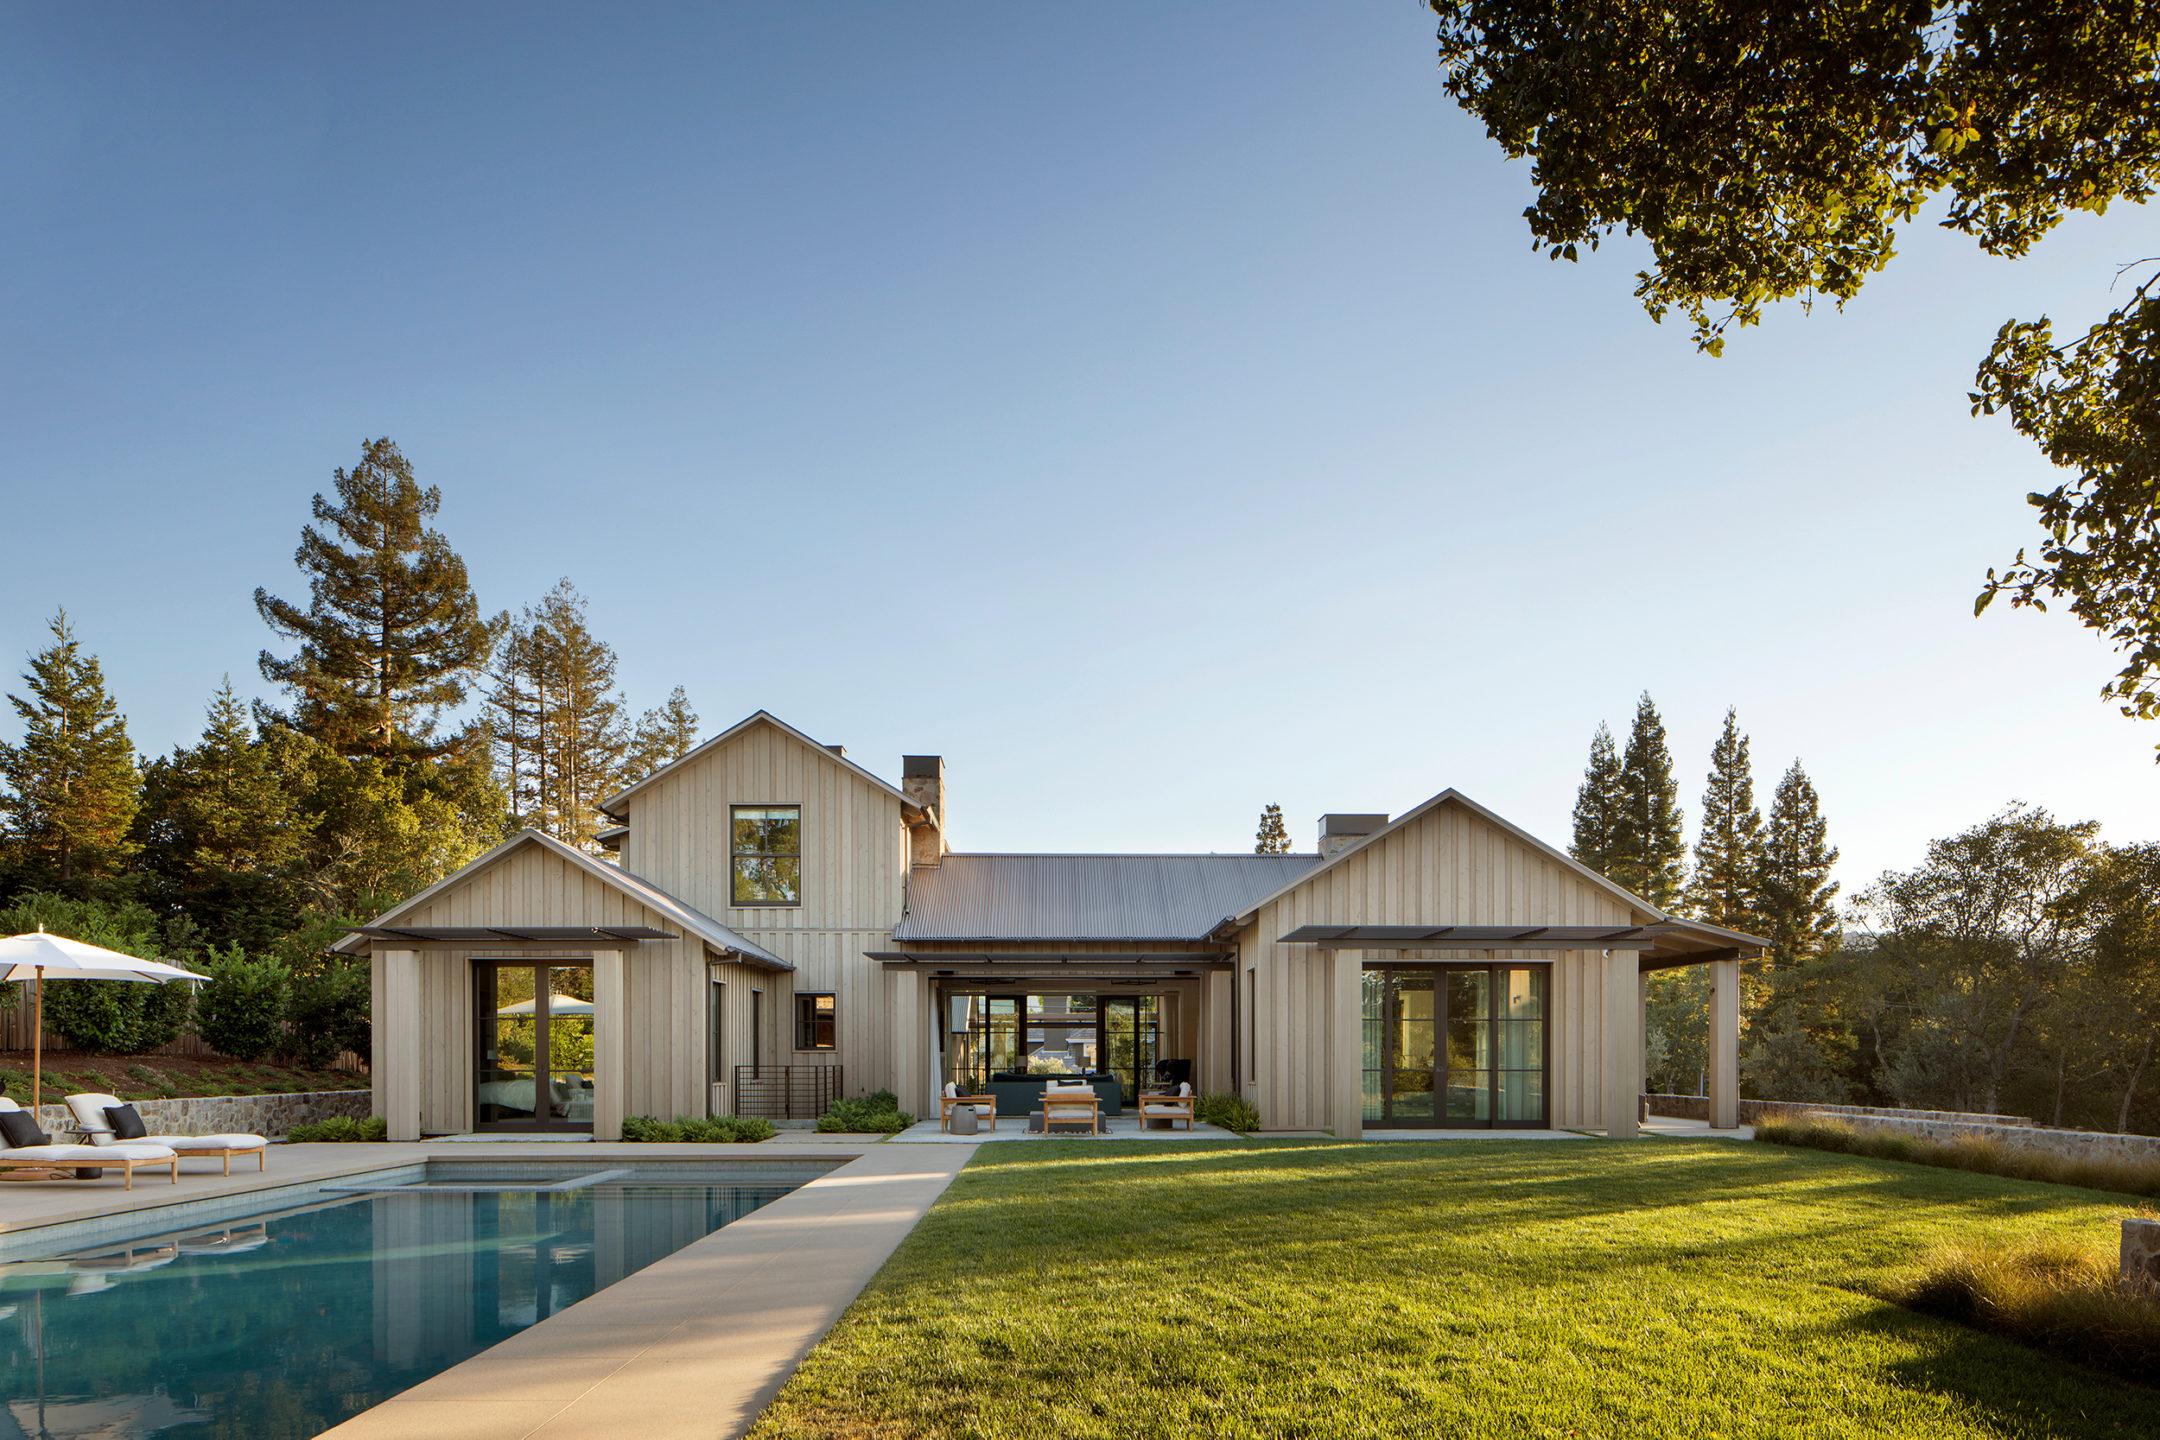 Jennifer_robins_interiors_projects_pacific_heights_portola_valley_exterior_ext_backyard_house_Portola_47_HR